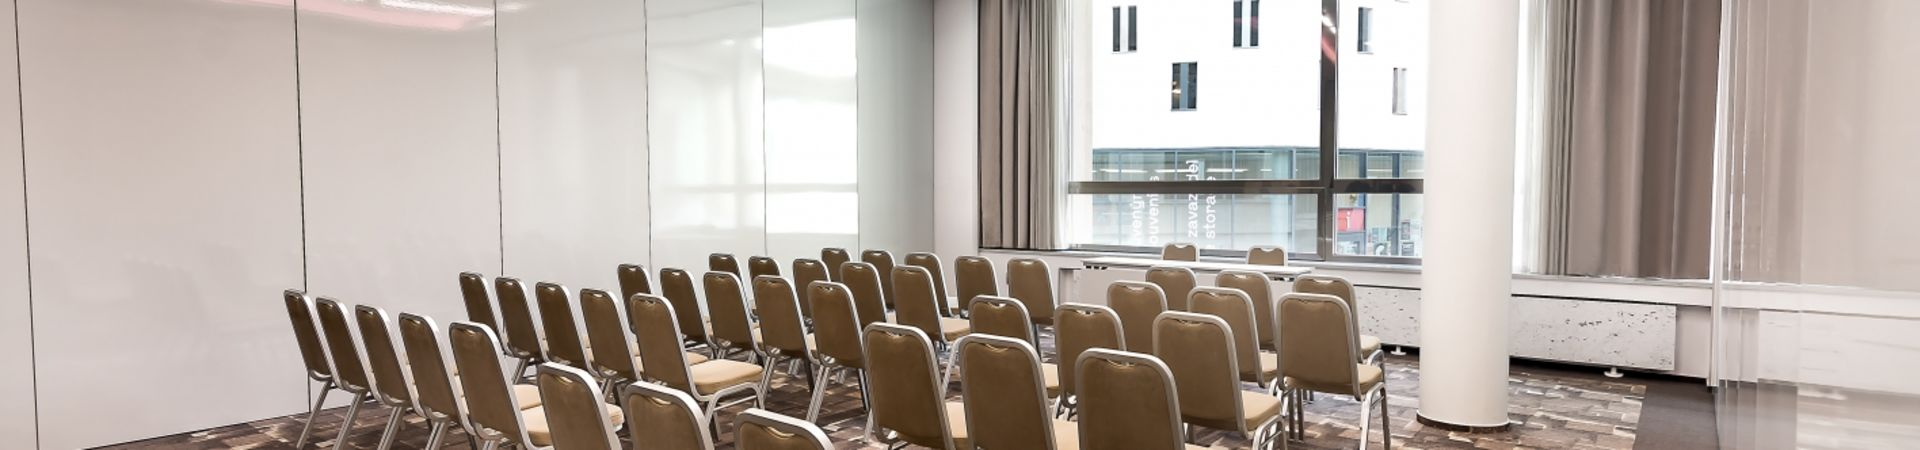 Best Western Premier Hotel International - Kongresový sál B + Kongresový sál C